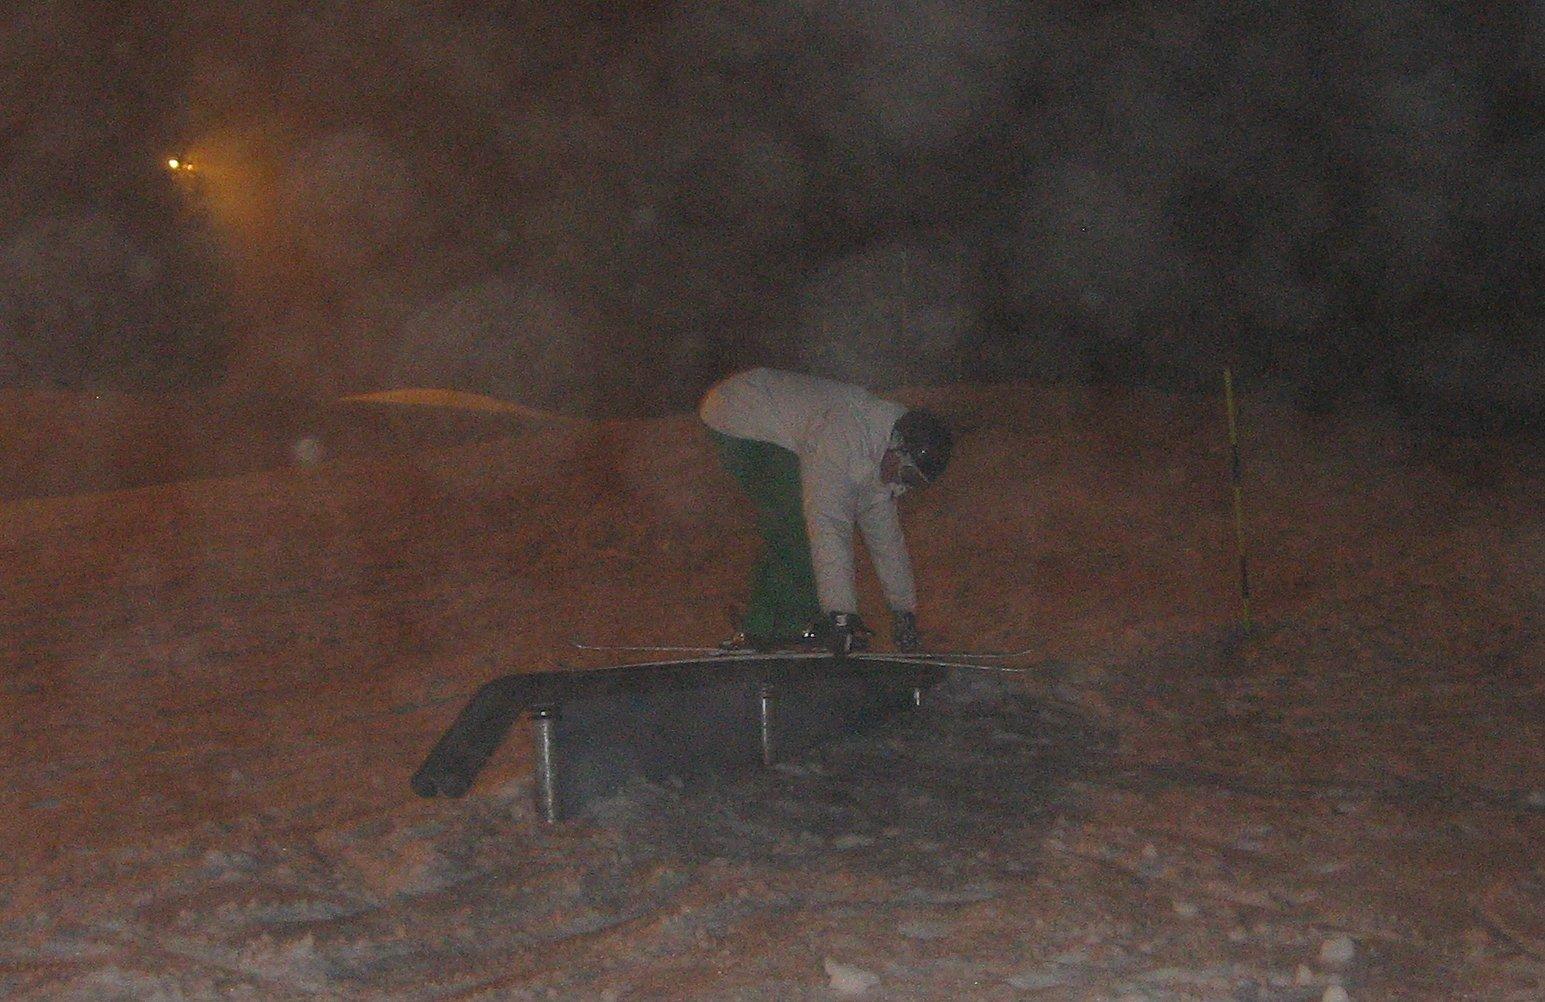 Truckdriverslide at Vallaasen, January 09